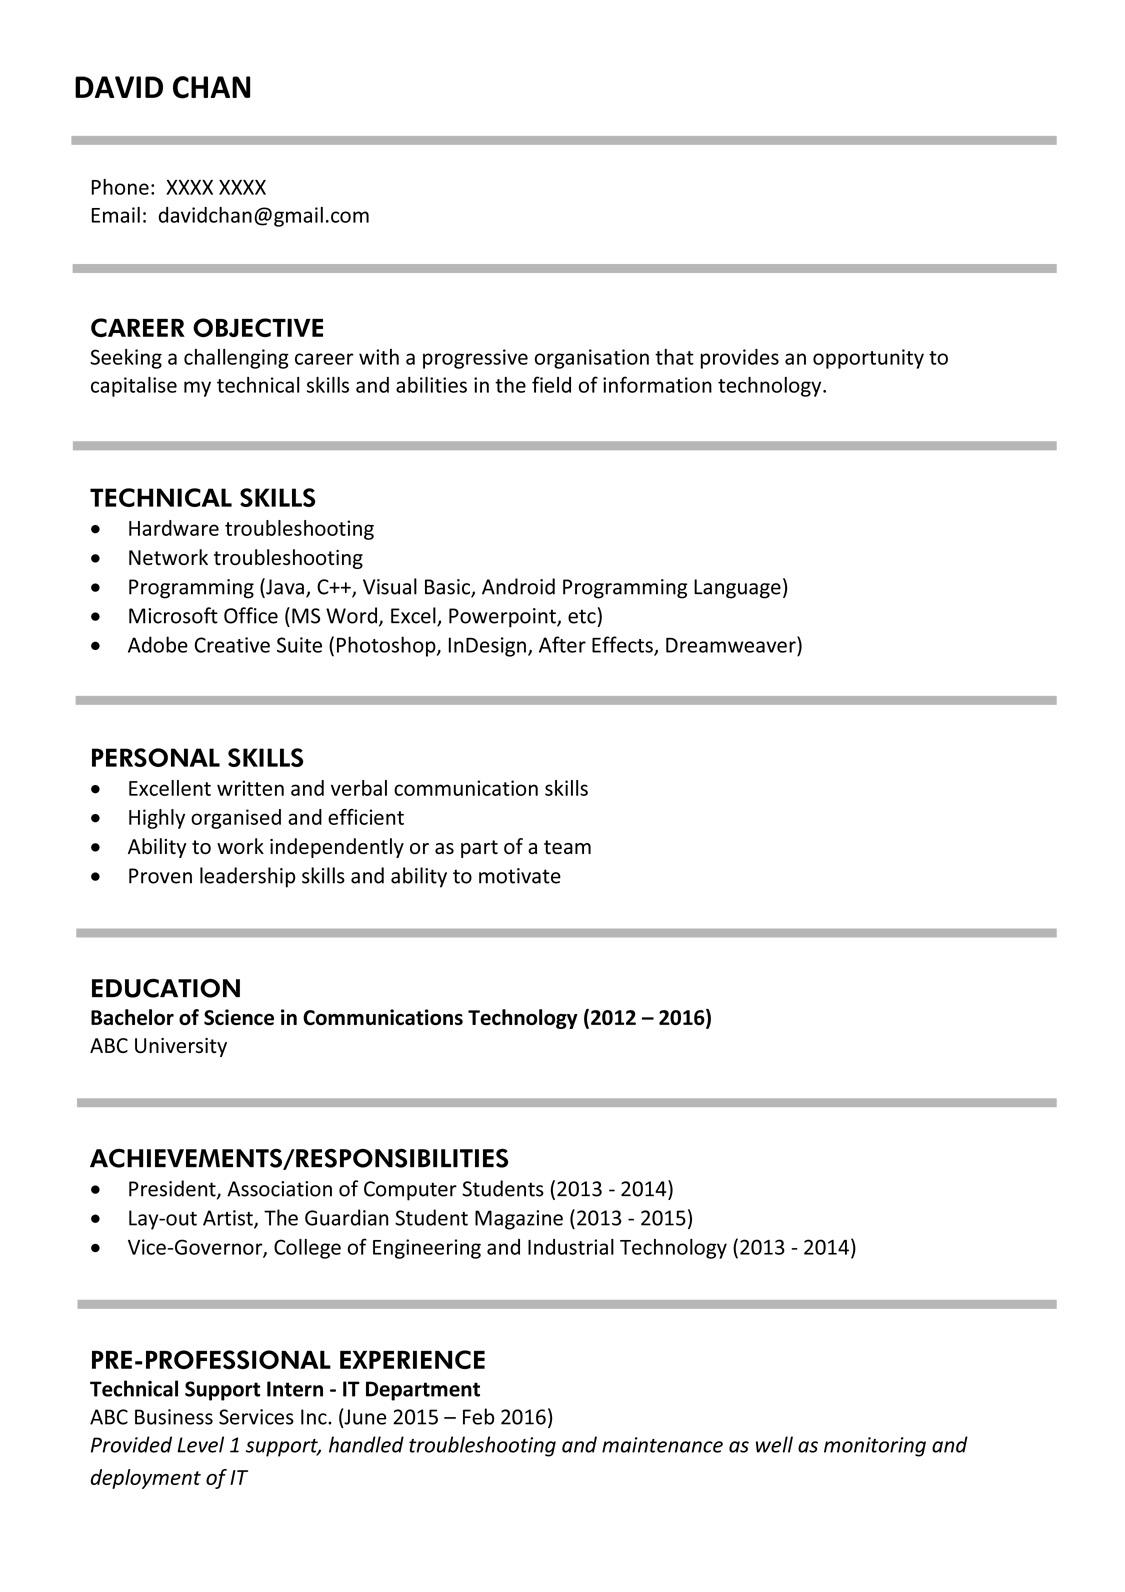 PhD Resume Example - Scientist - Training - Biosciences